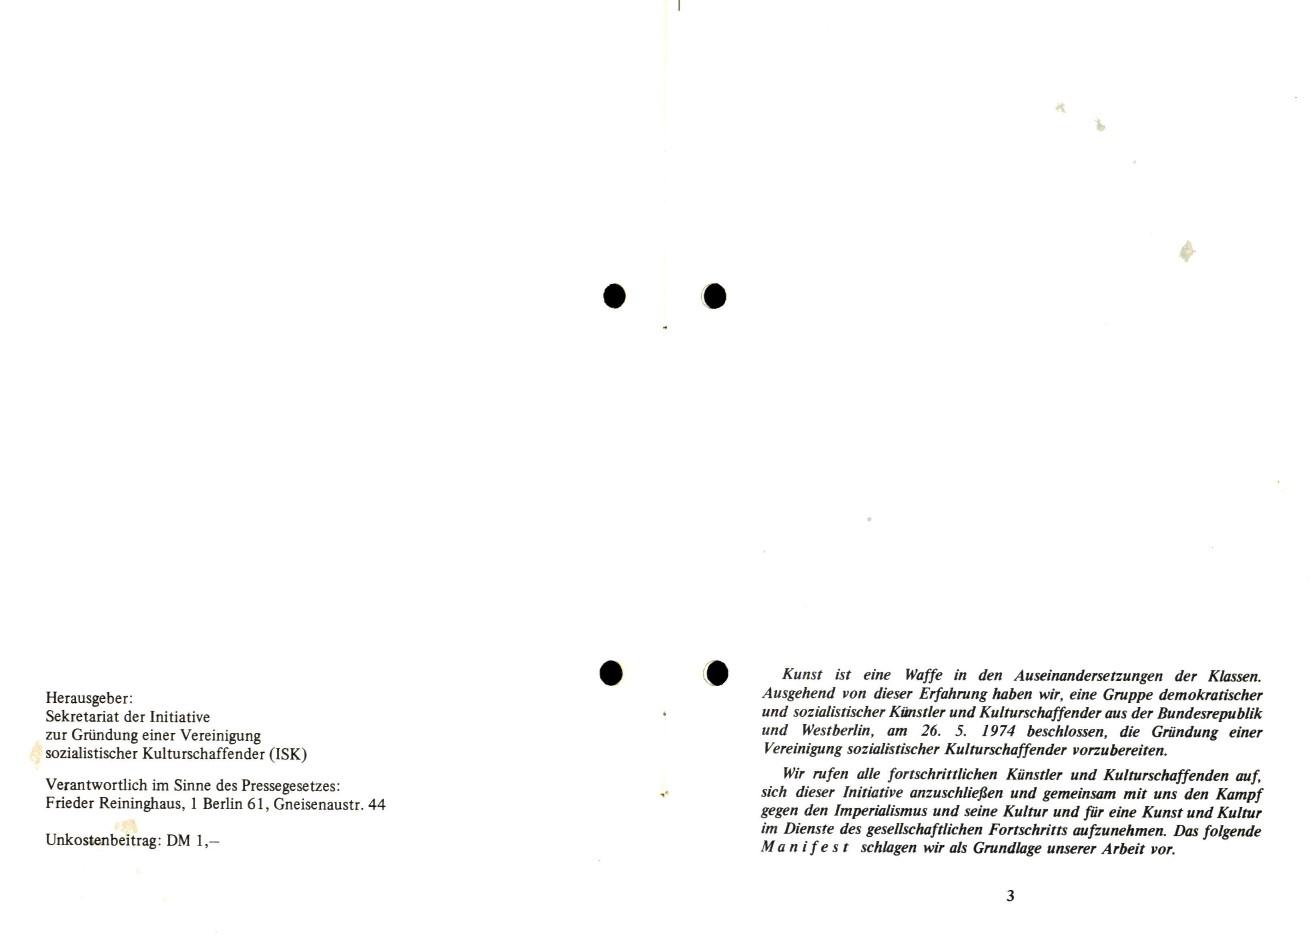 VSK_1974_Manifest_03